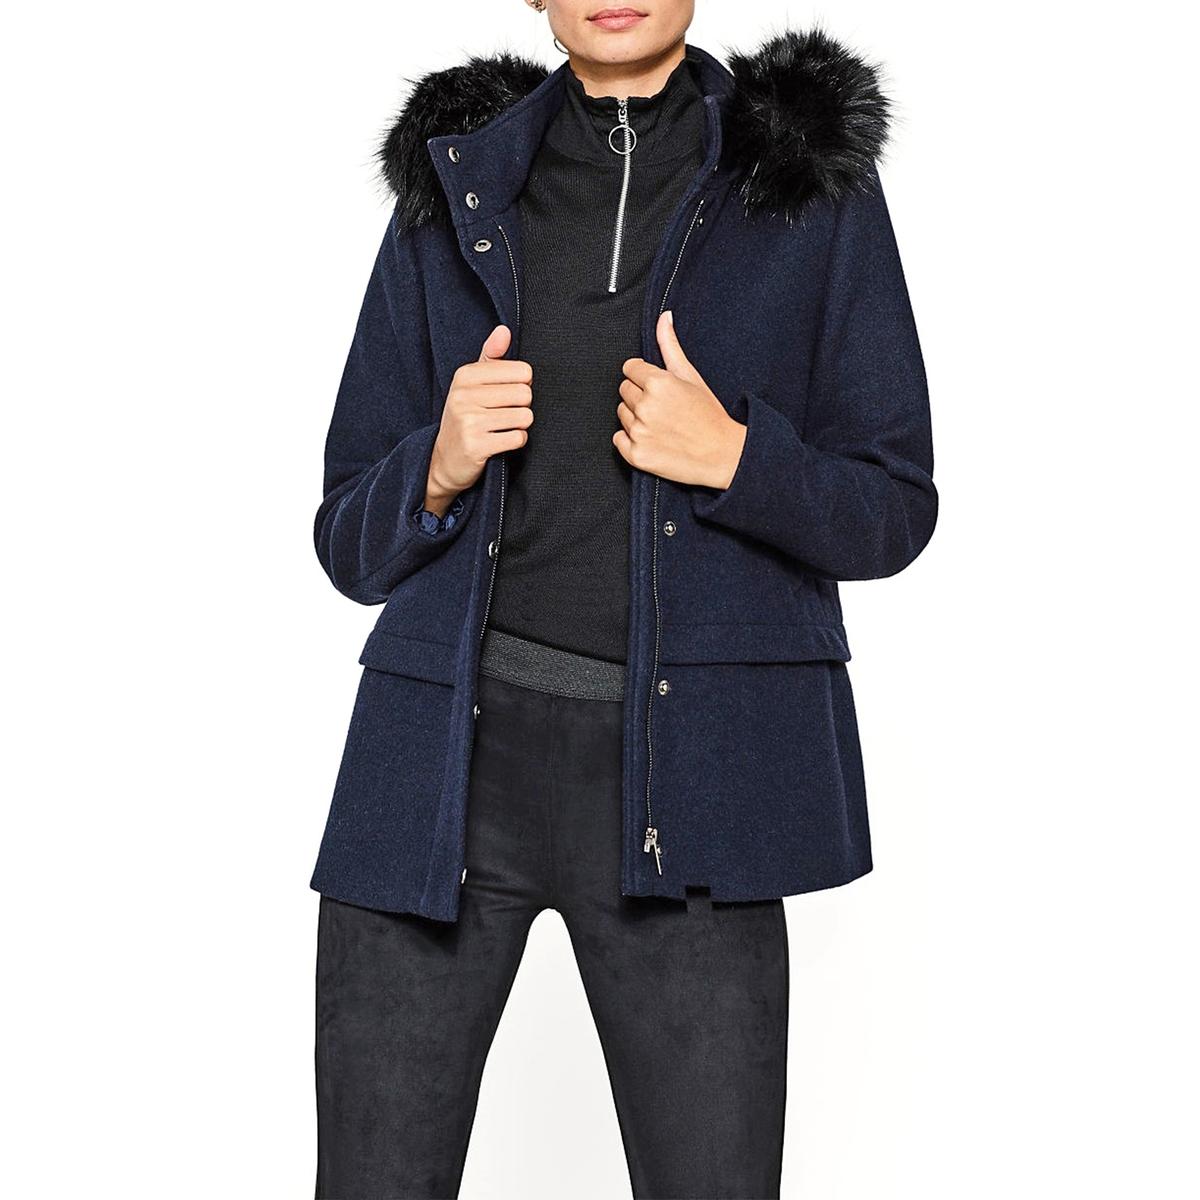 Abrigo mujer con capucha con contorno de pelo sintético